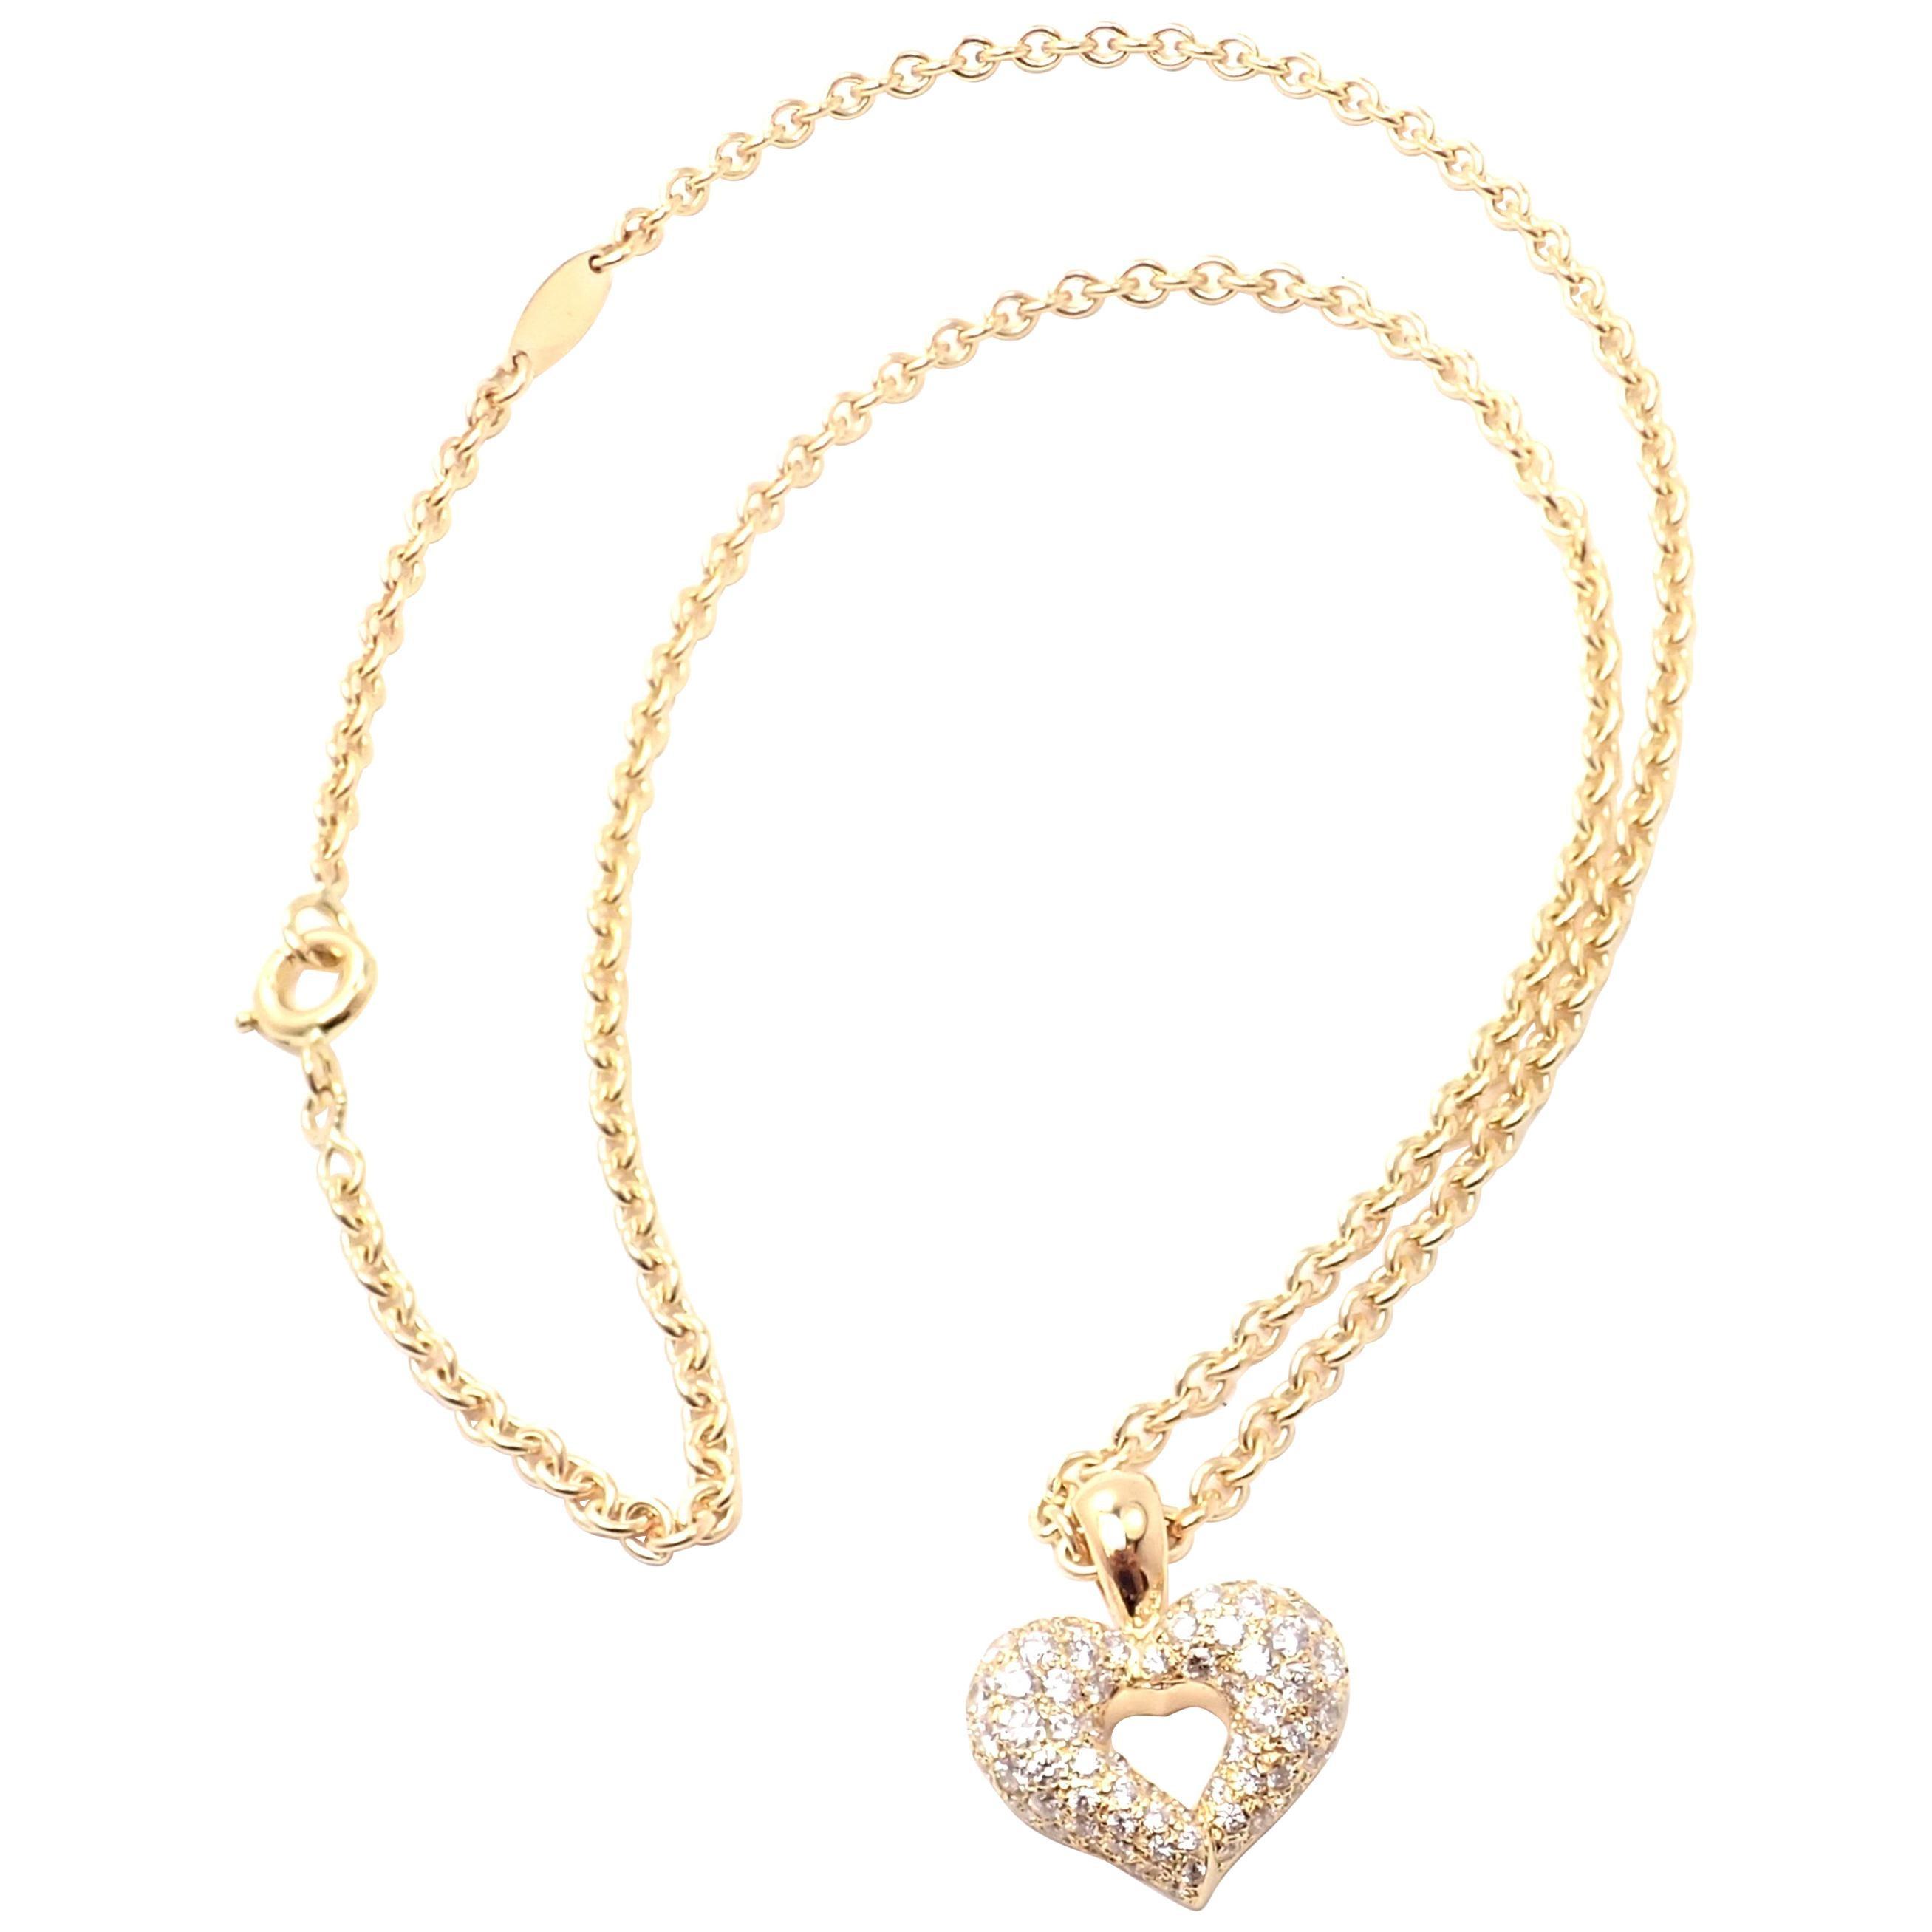 Van Cleef & Arpels Diamond Heart Yellow Gold Pendant Necklace